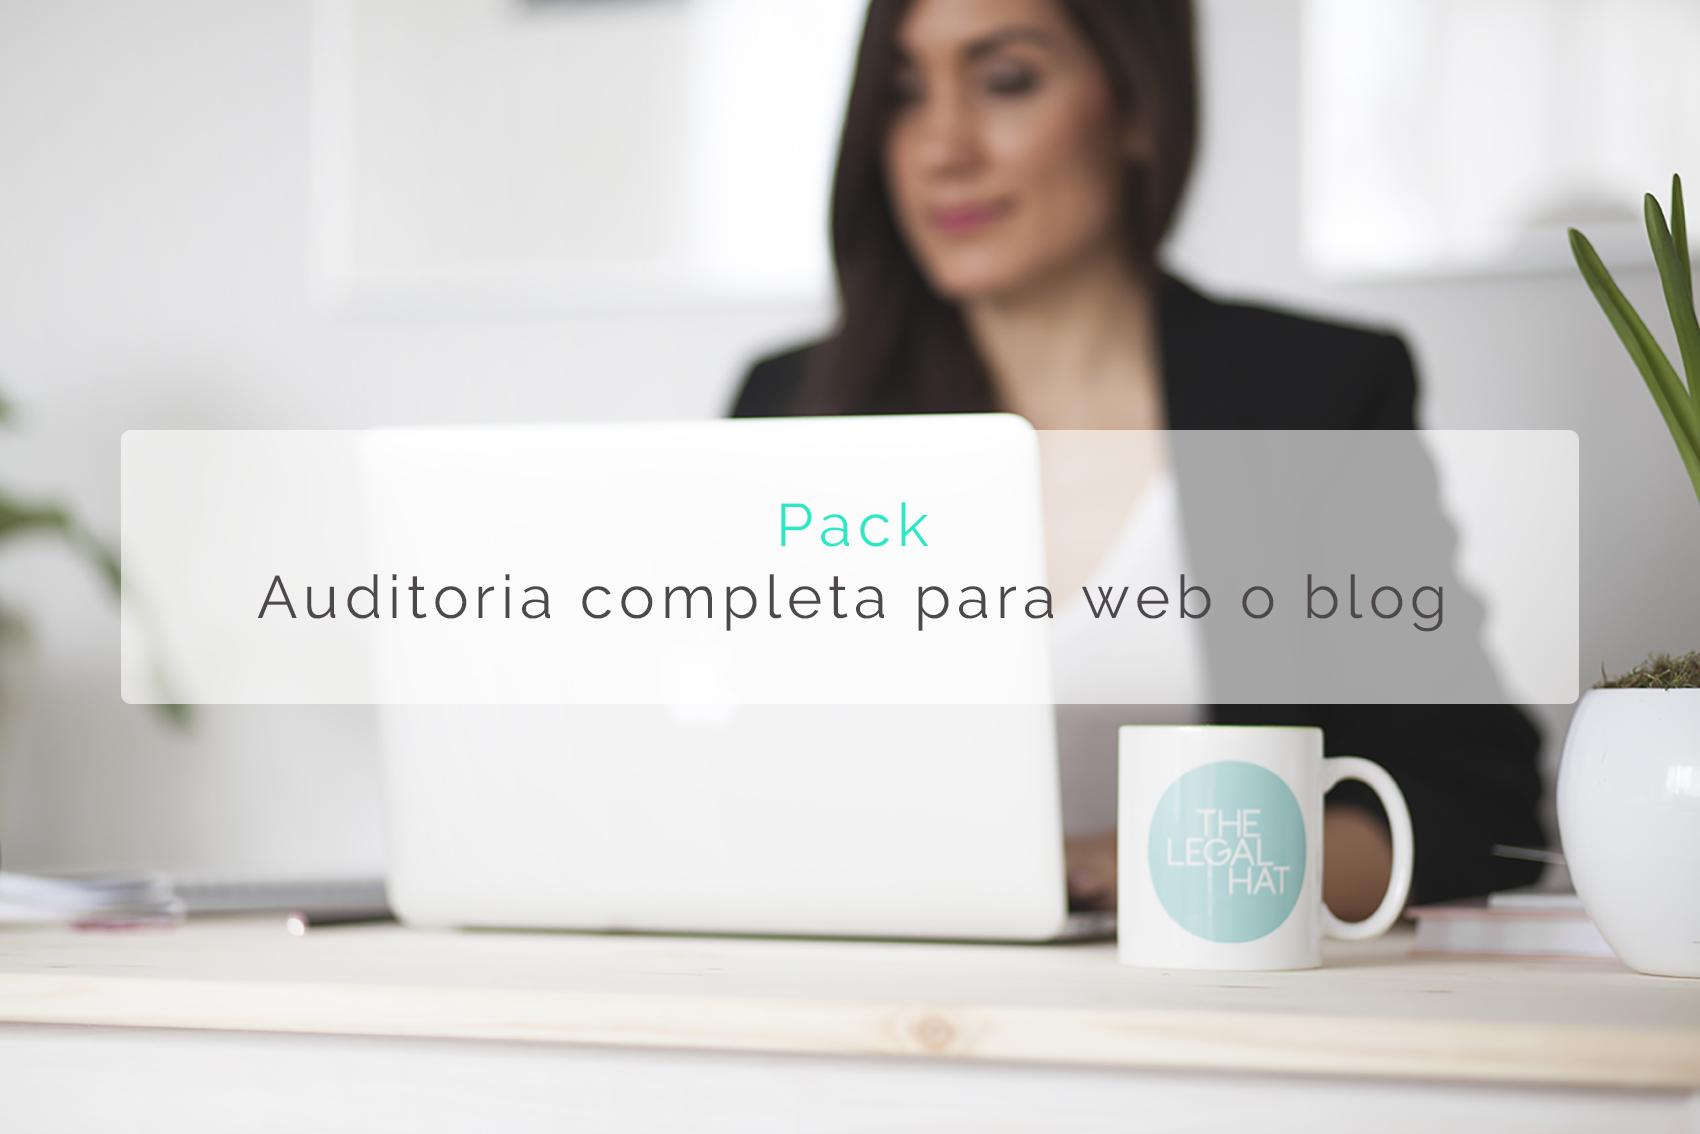 PackTheLegalHat-AuditoriaWebBlog